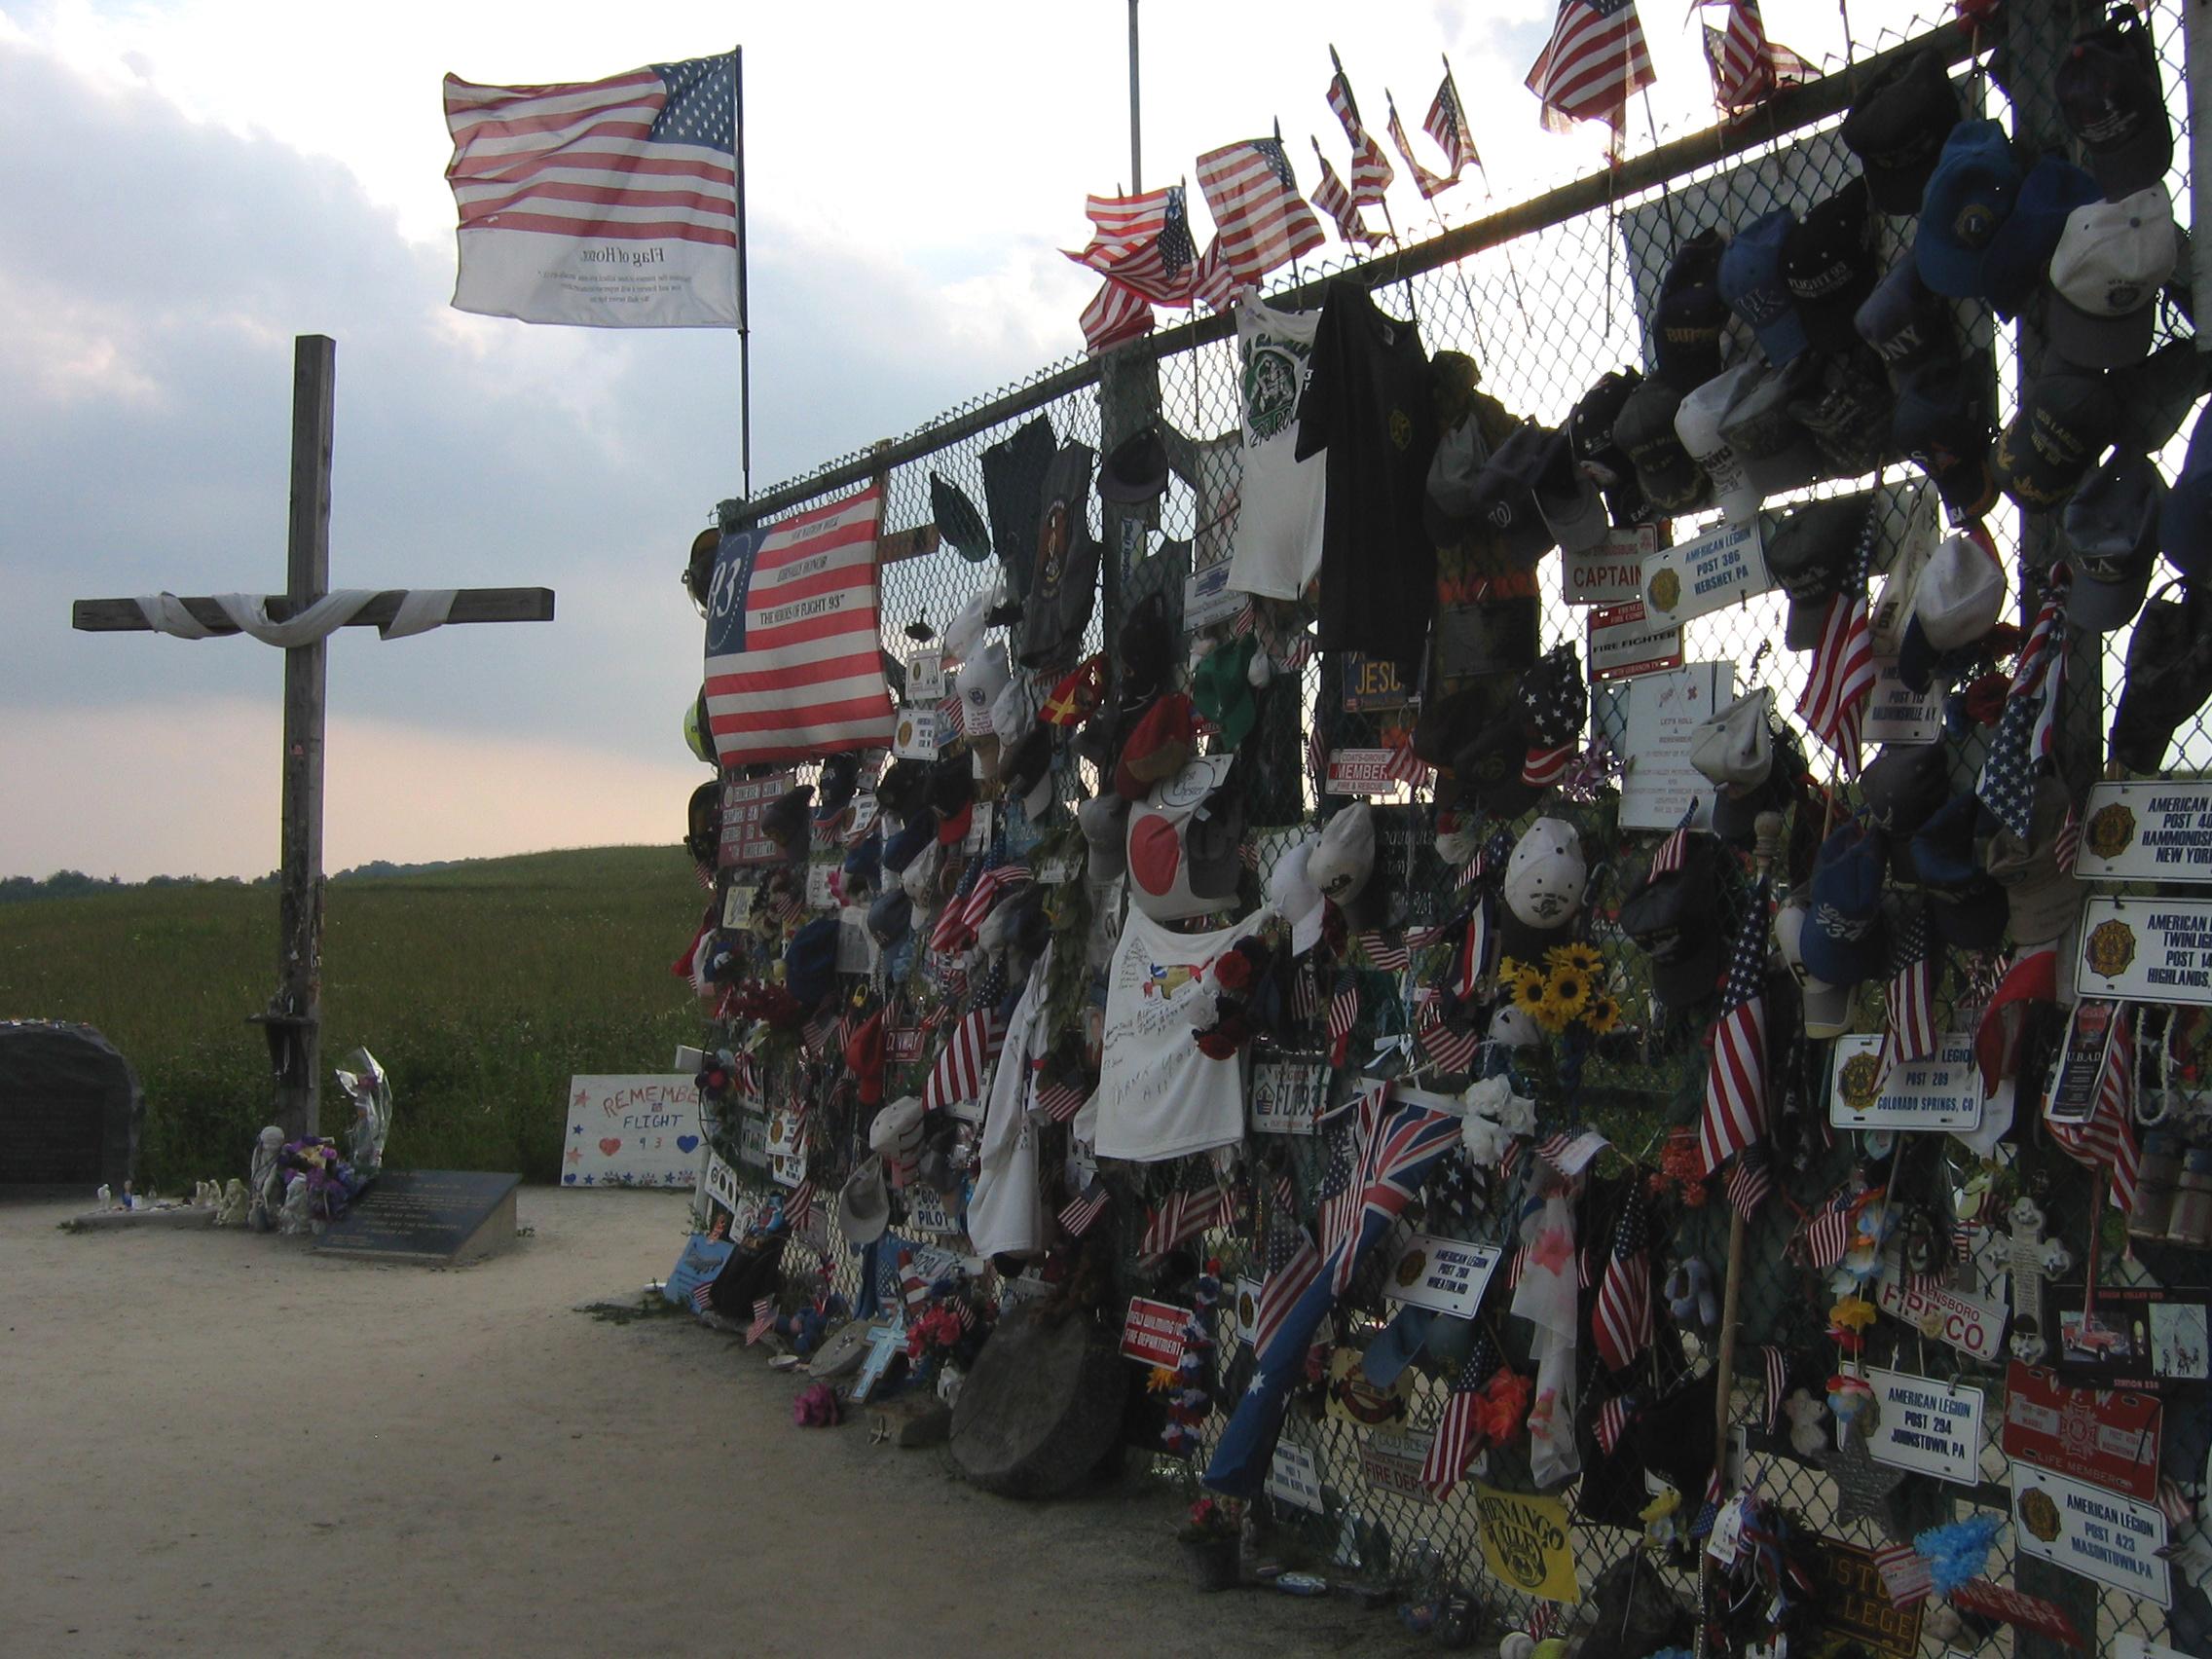 https://i0.wp.com/upload.wikimedia.org/wikipedia/commons/c/c6/Flight_93_memorial_fence.jpg